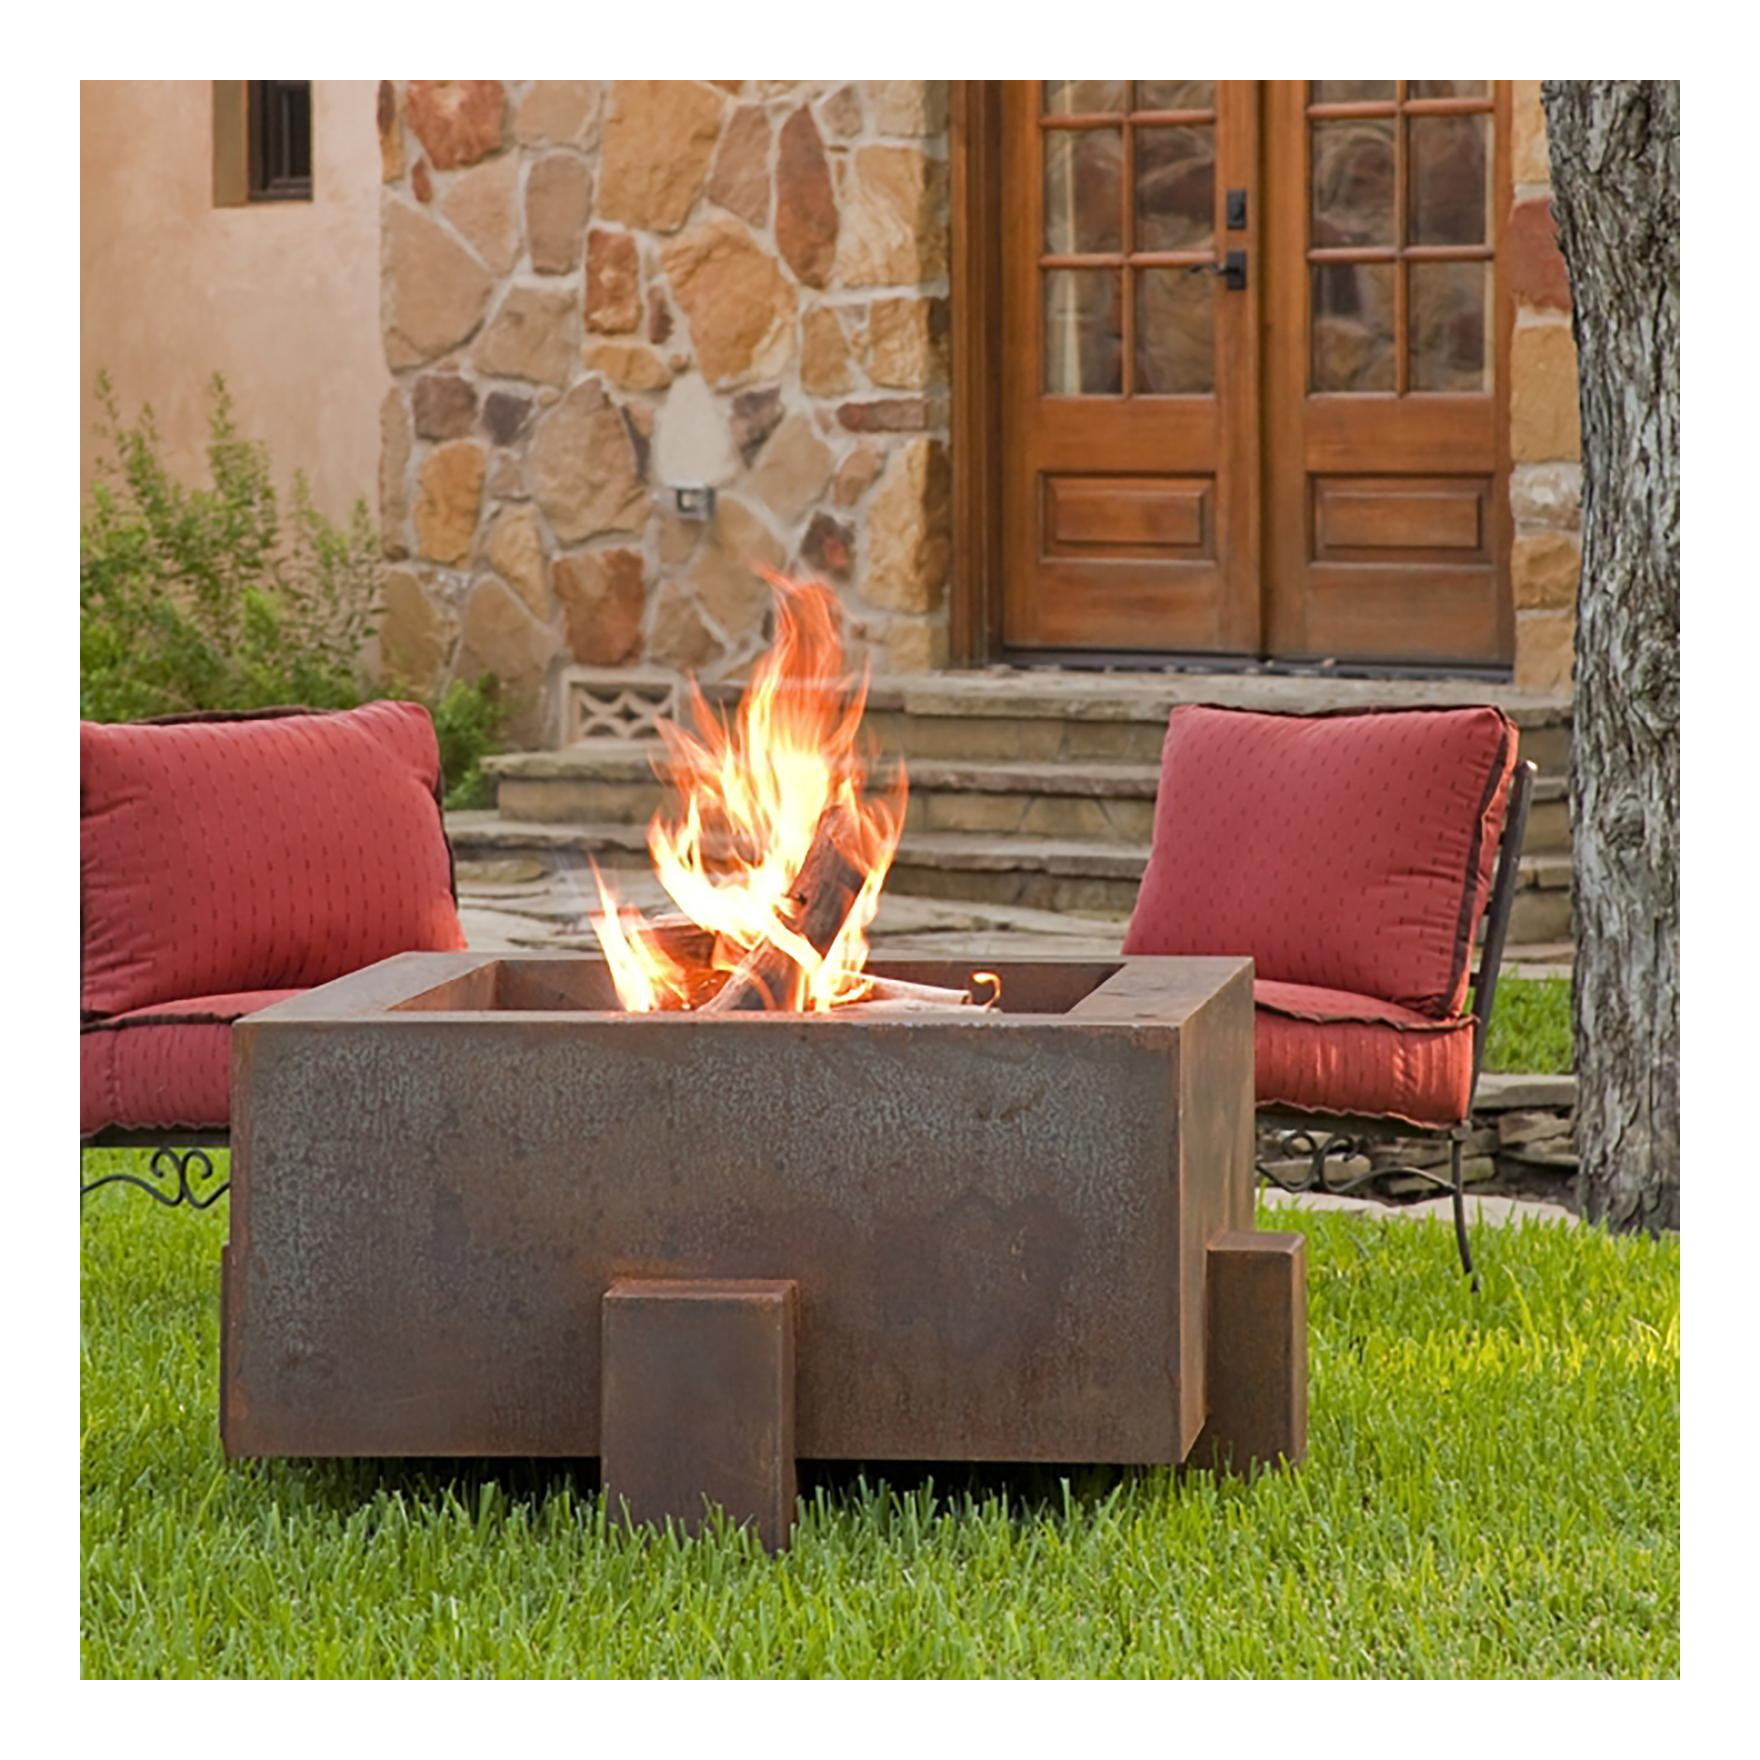 A cor-ten fire pit setup in the grass of a backyard